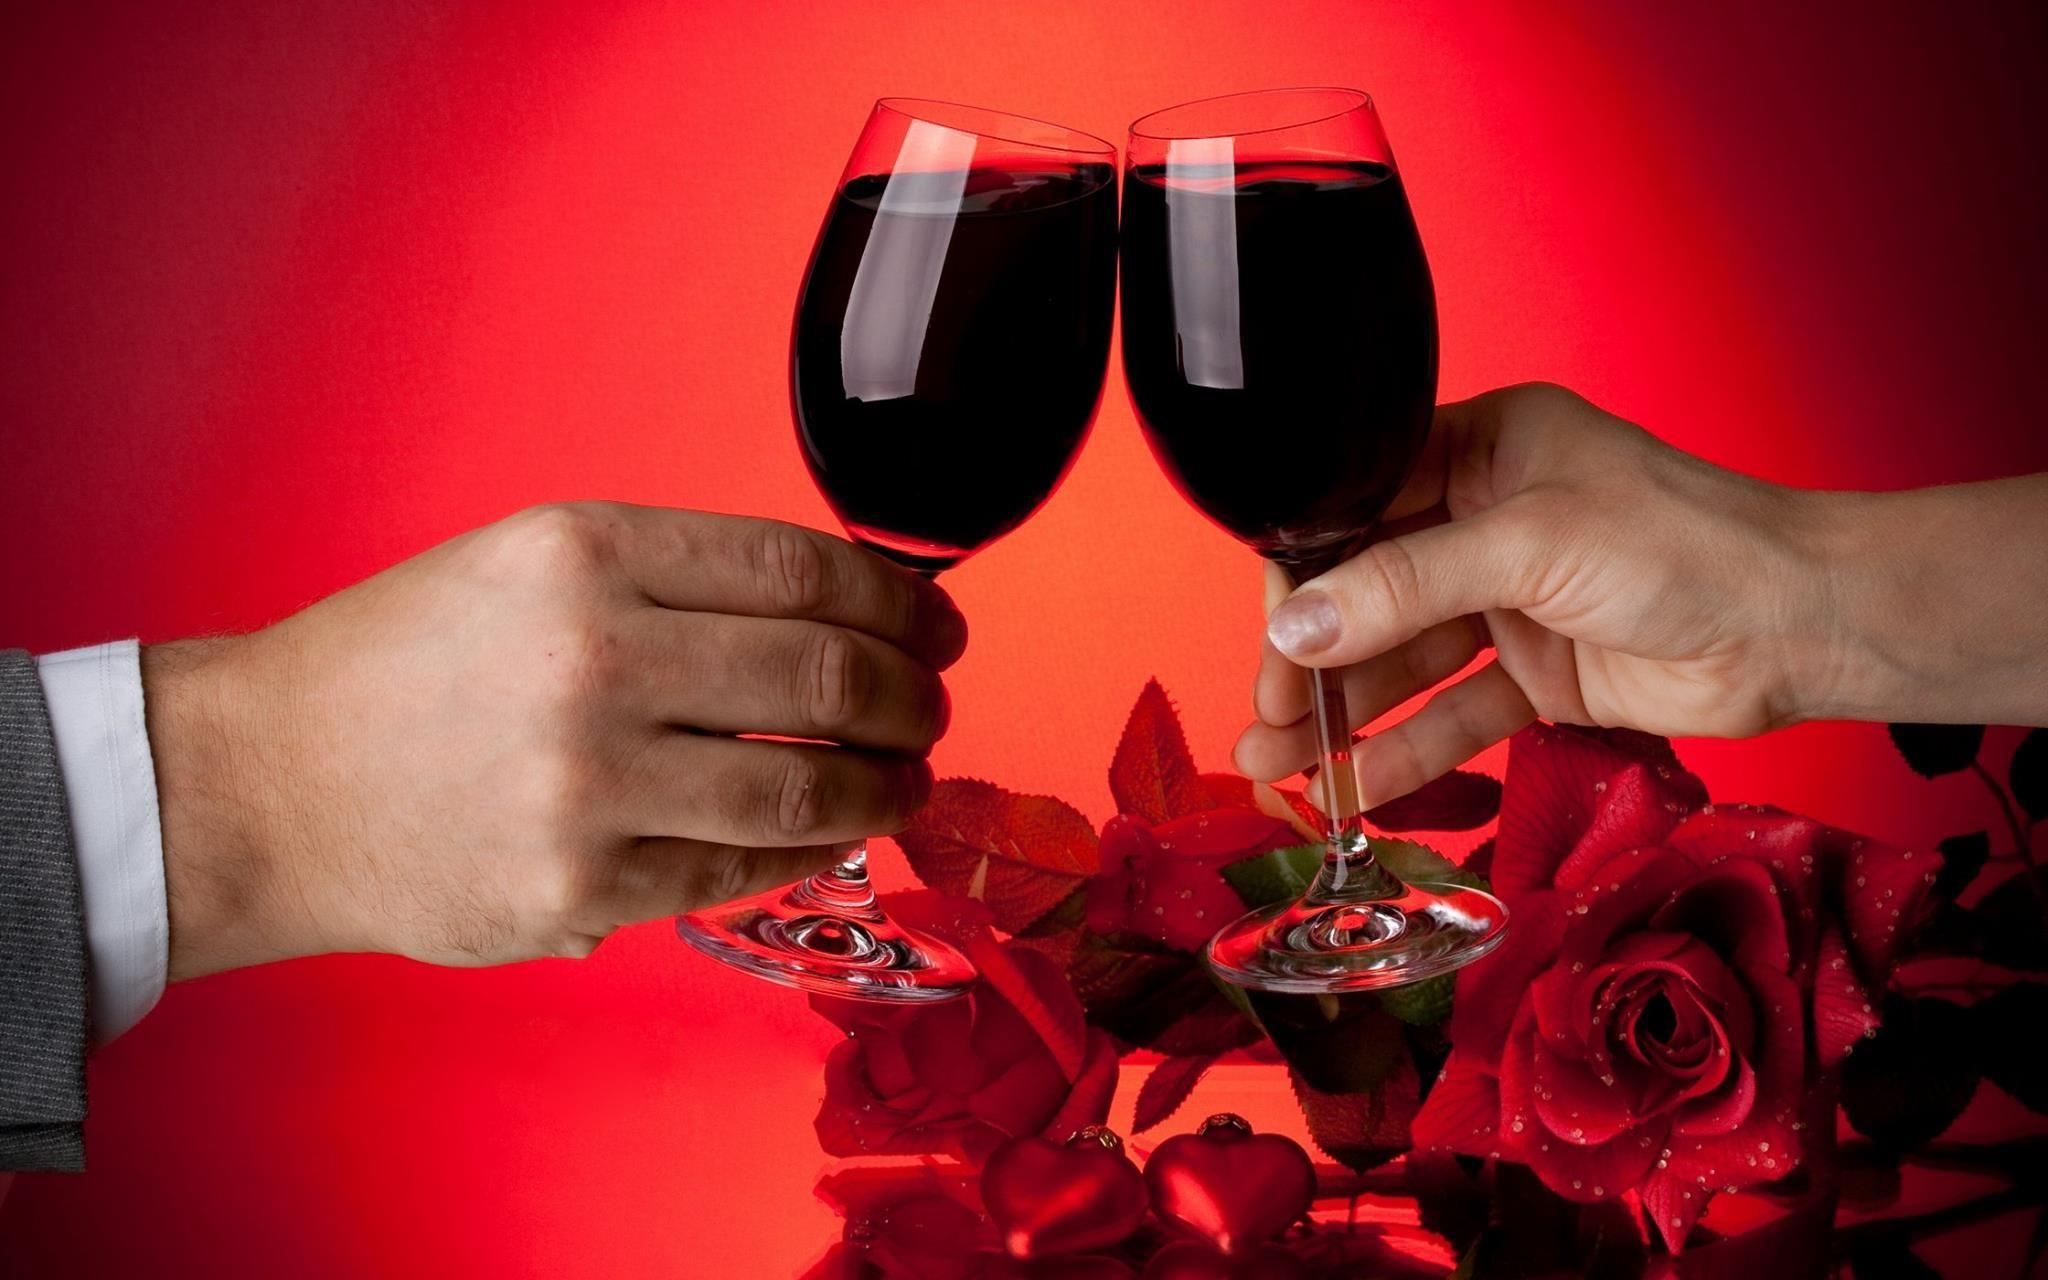 Romances Wine Wallpaper Red Wine Wine And Spirits